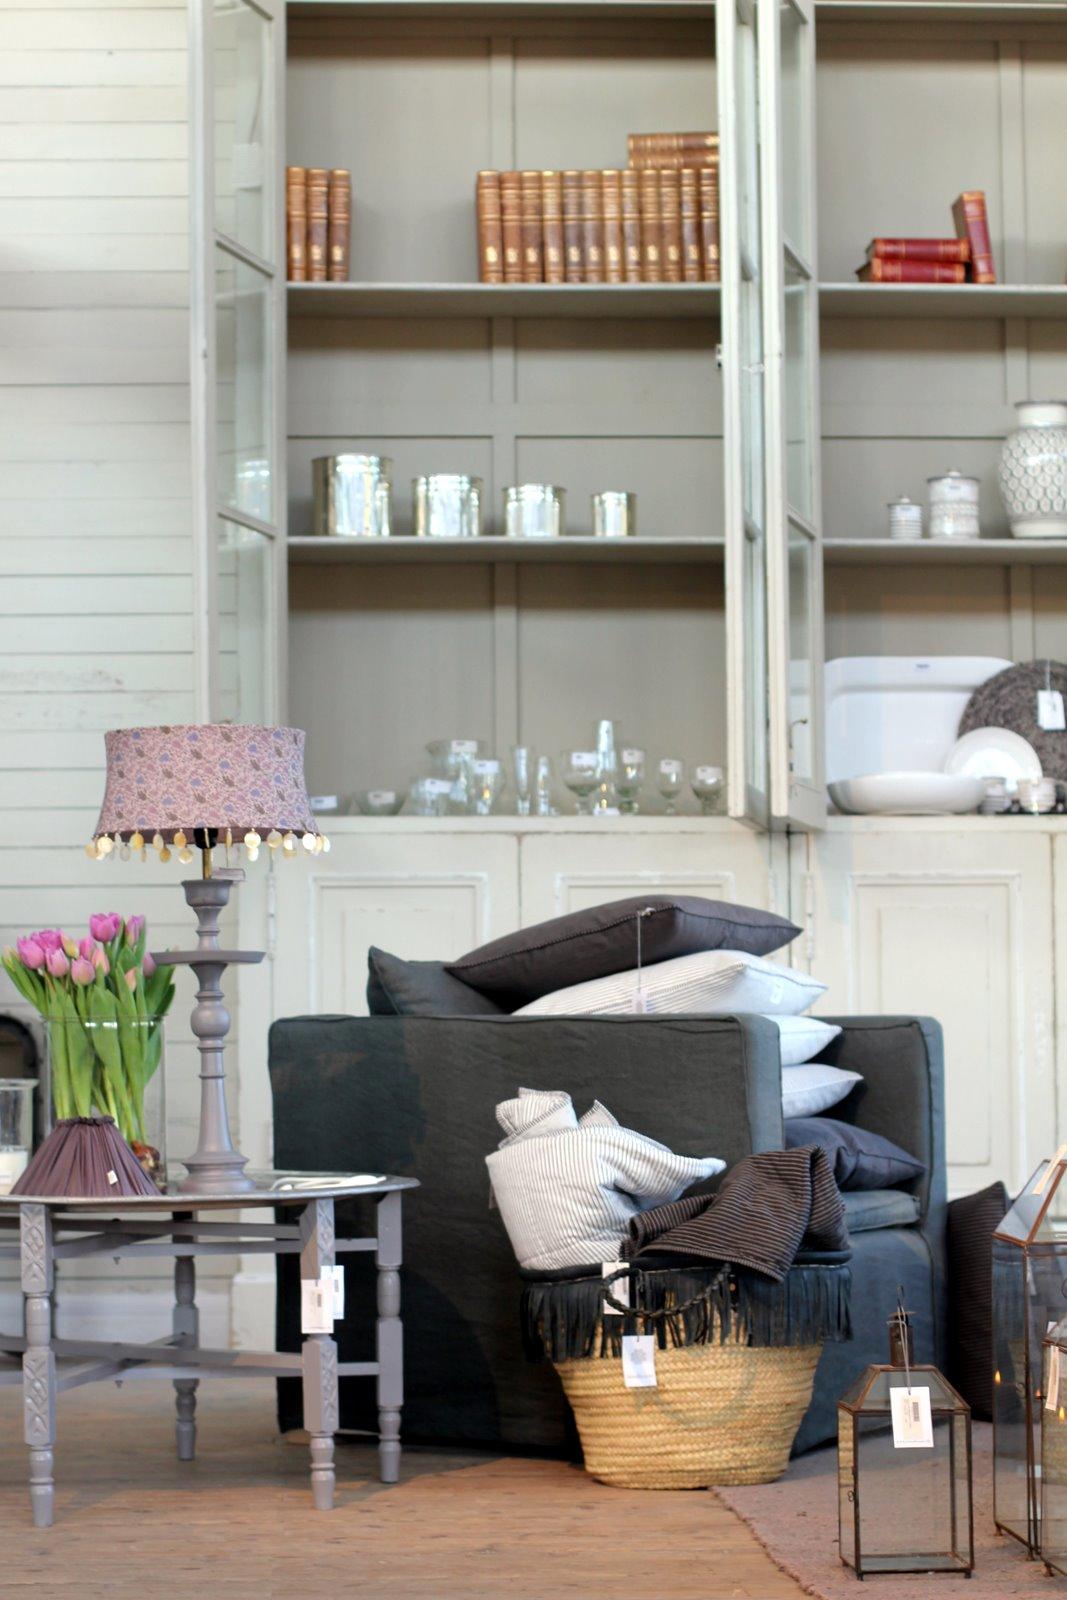 seventeendoors tine k home part two. Black Bedroom Furniture Sets. Home Design Ideas